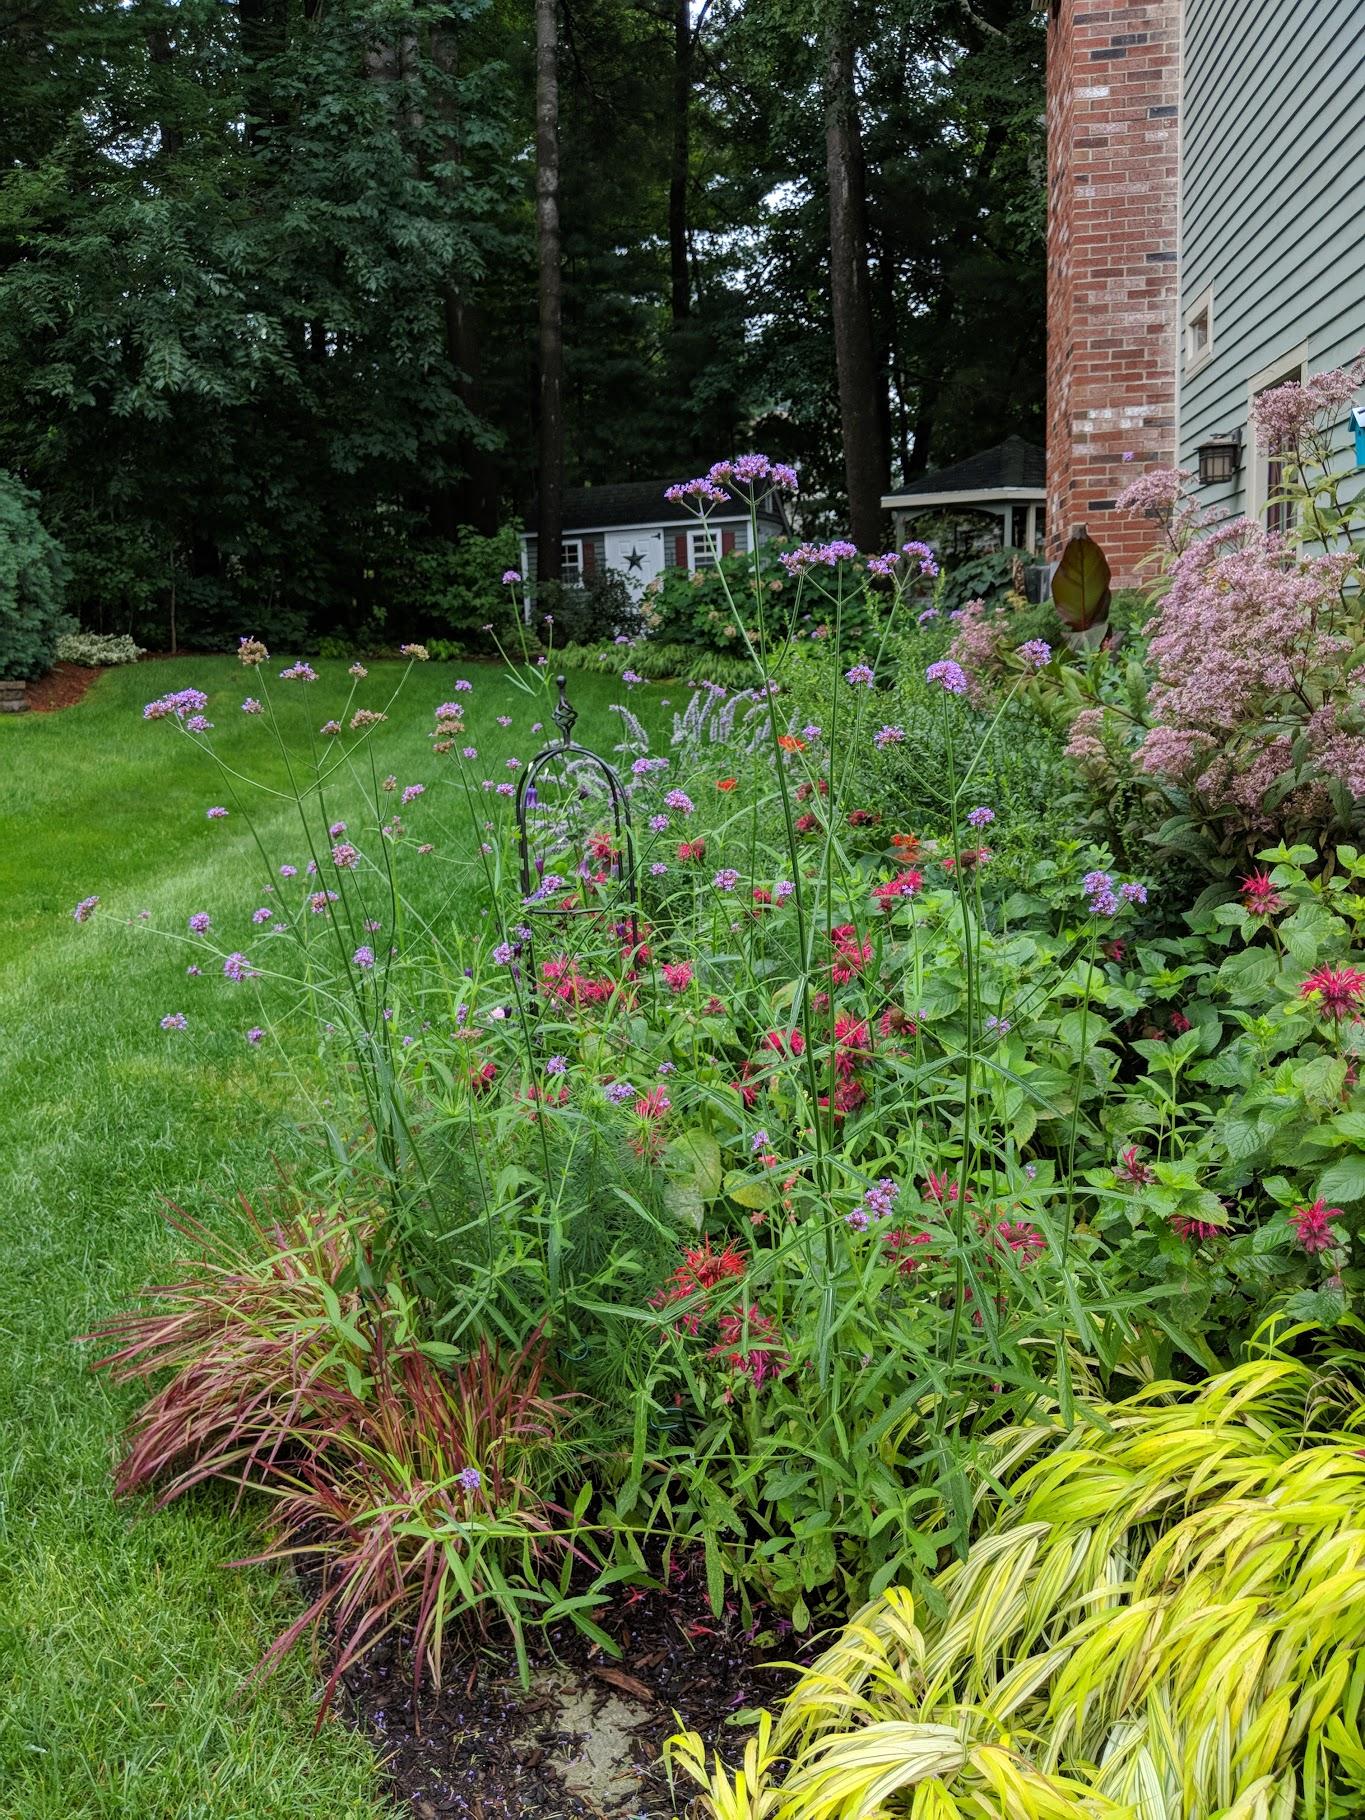 Verbena bonariensis is my favorite annual for lightening up a 'heavy' garden